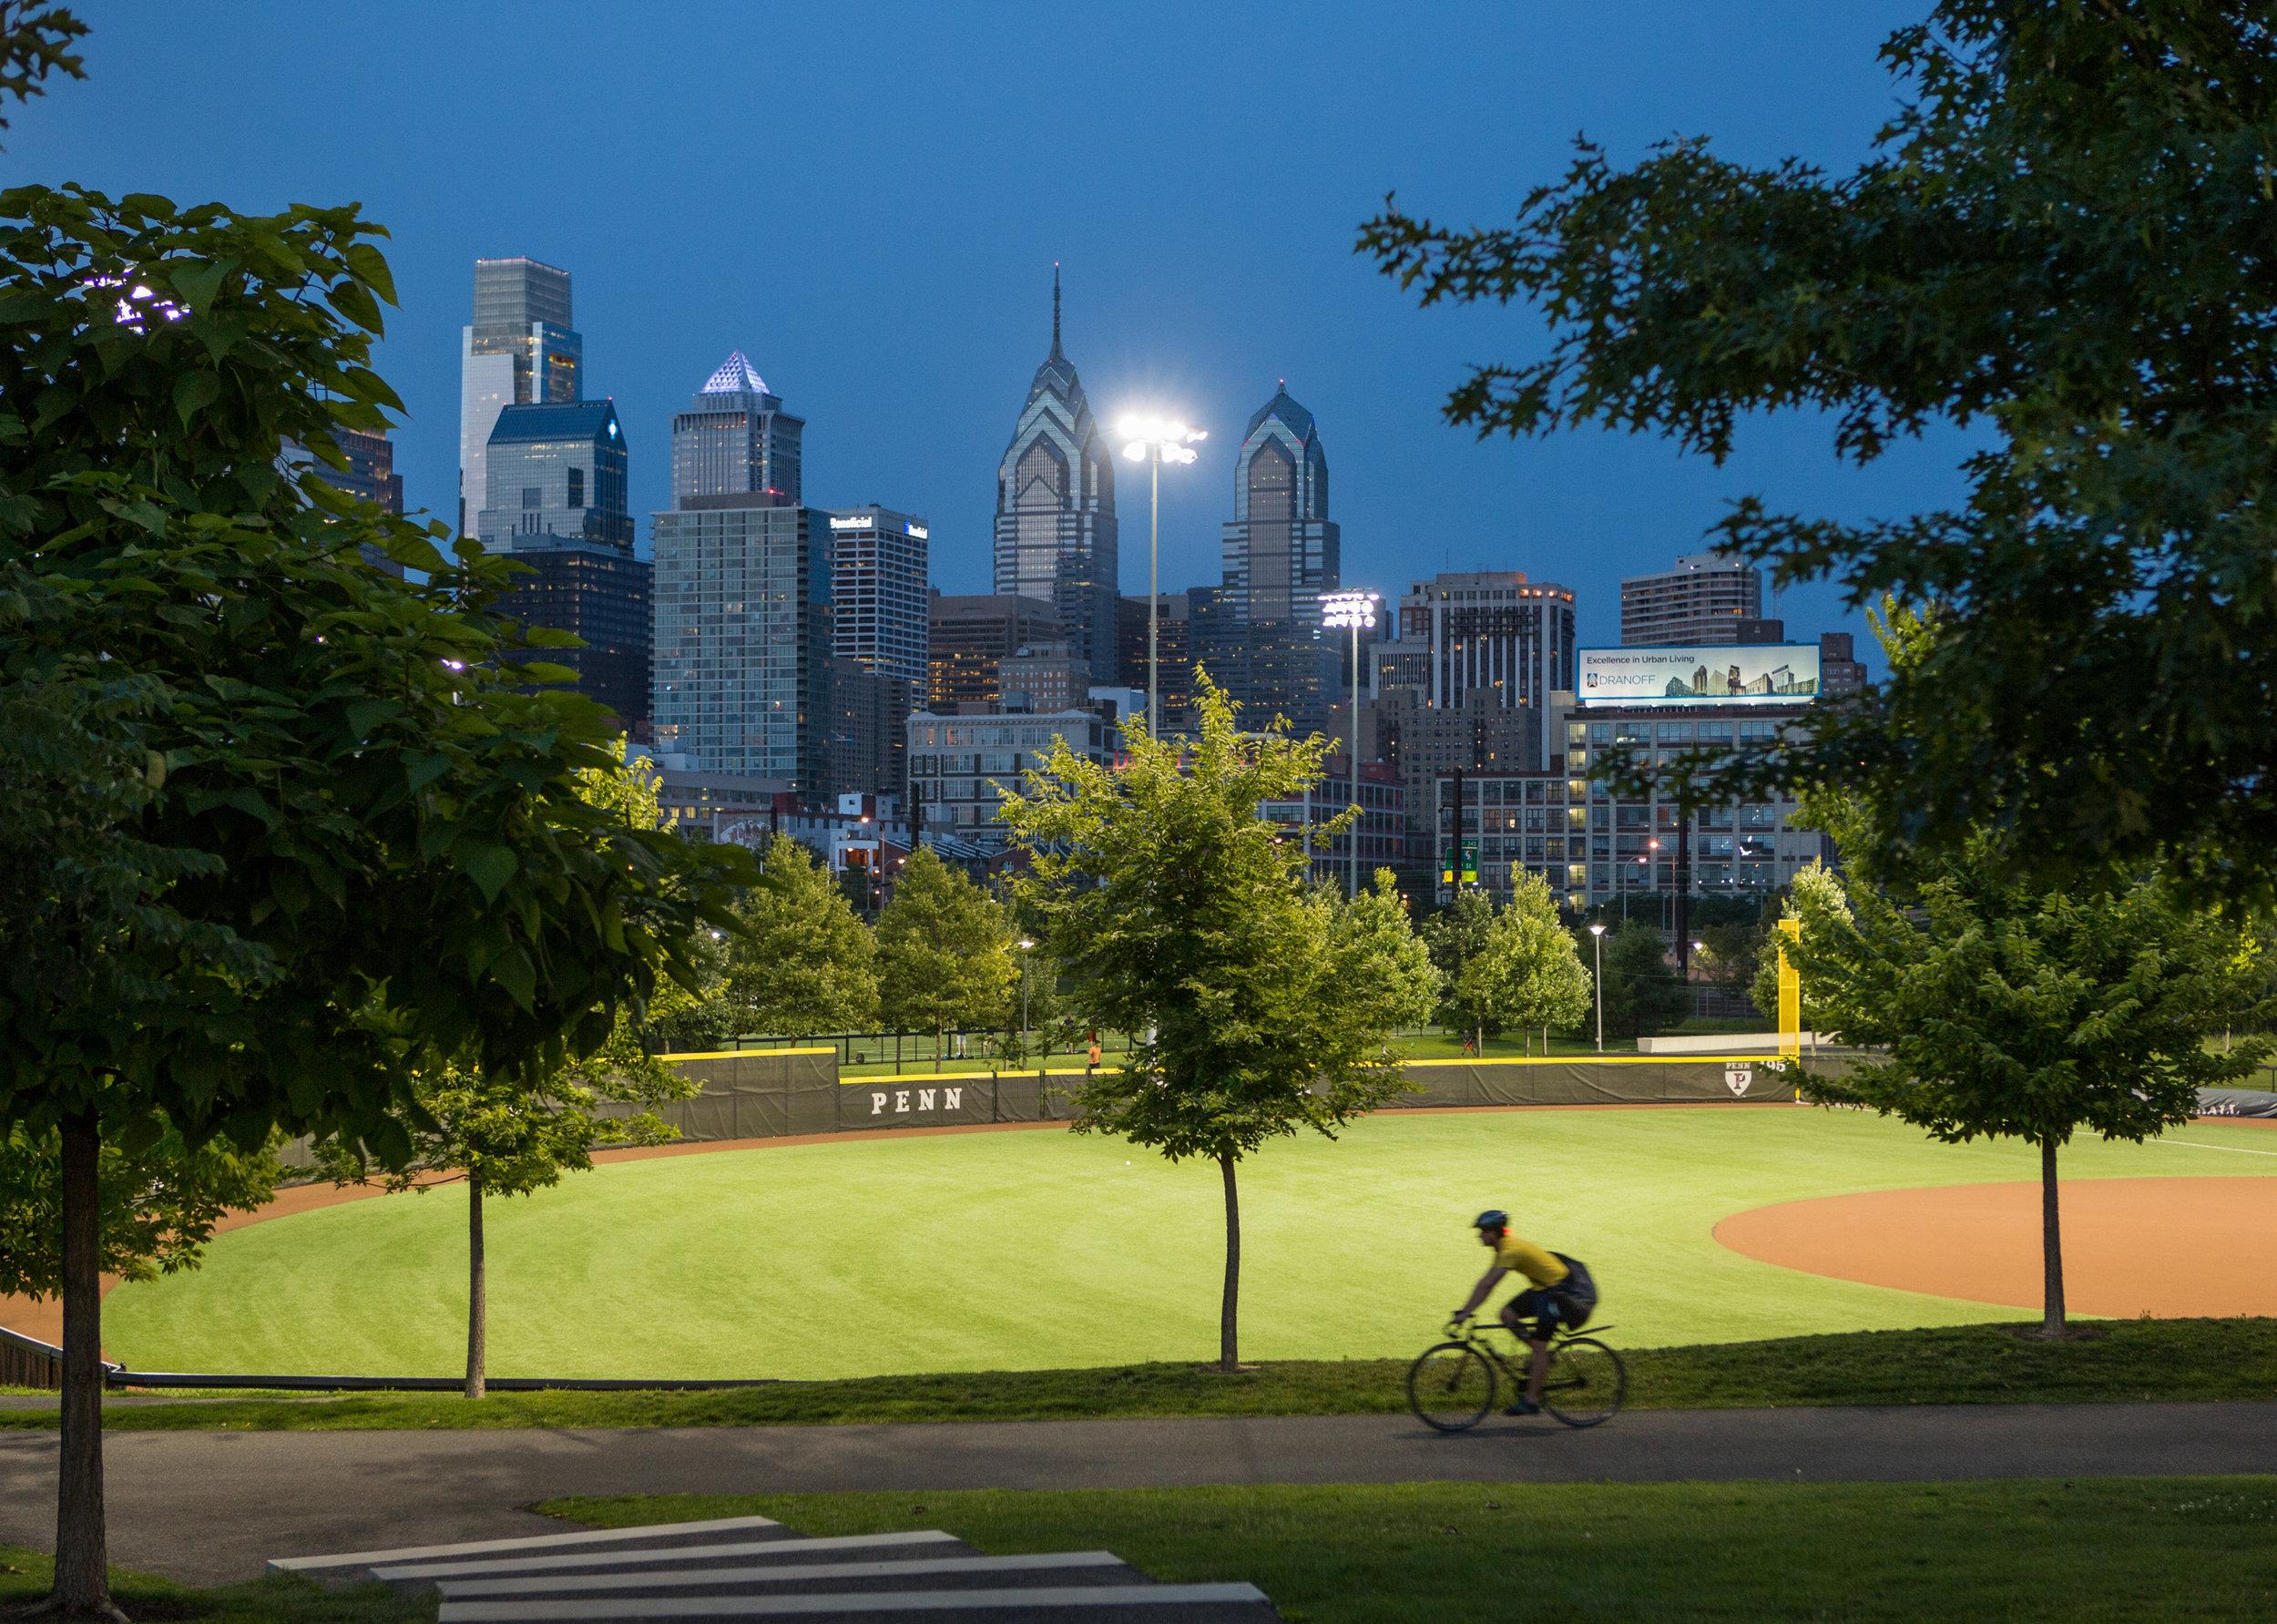 Penn Park via bicycle.